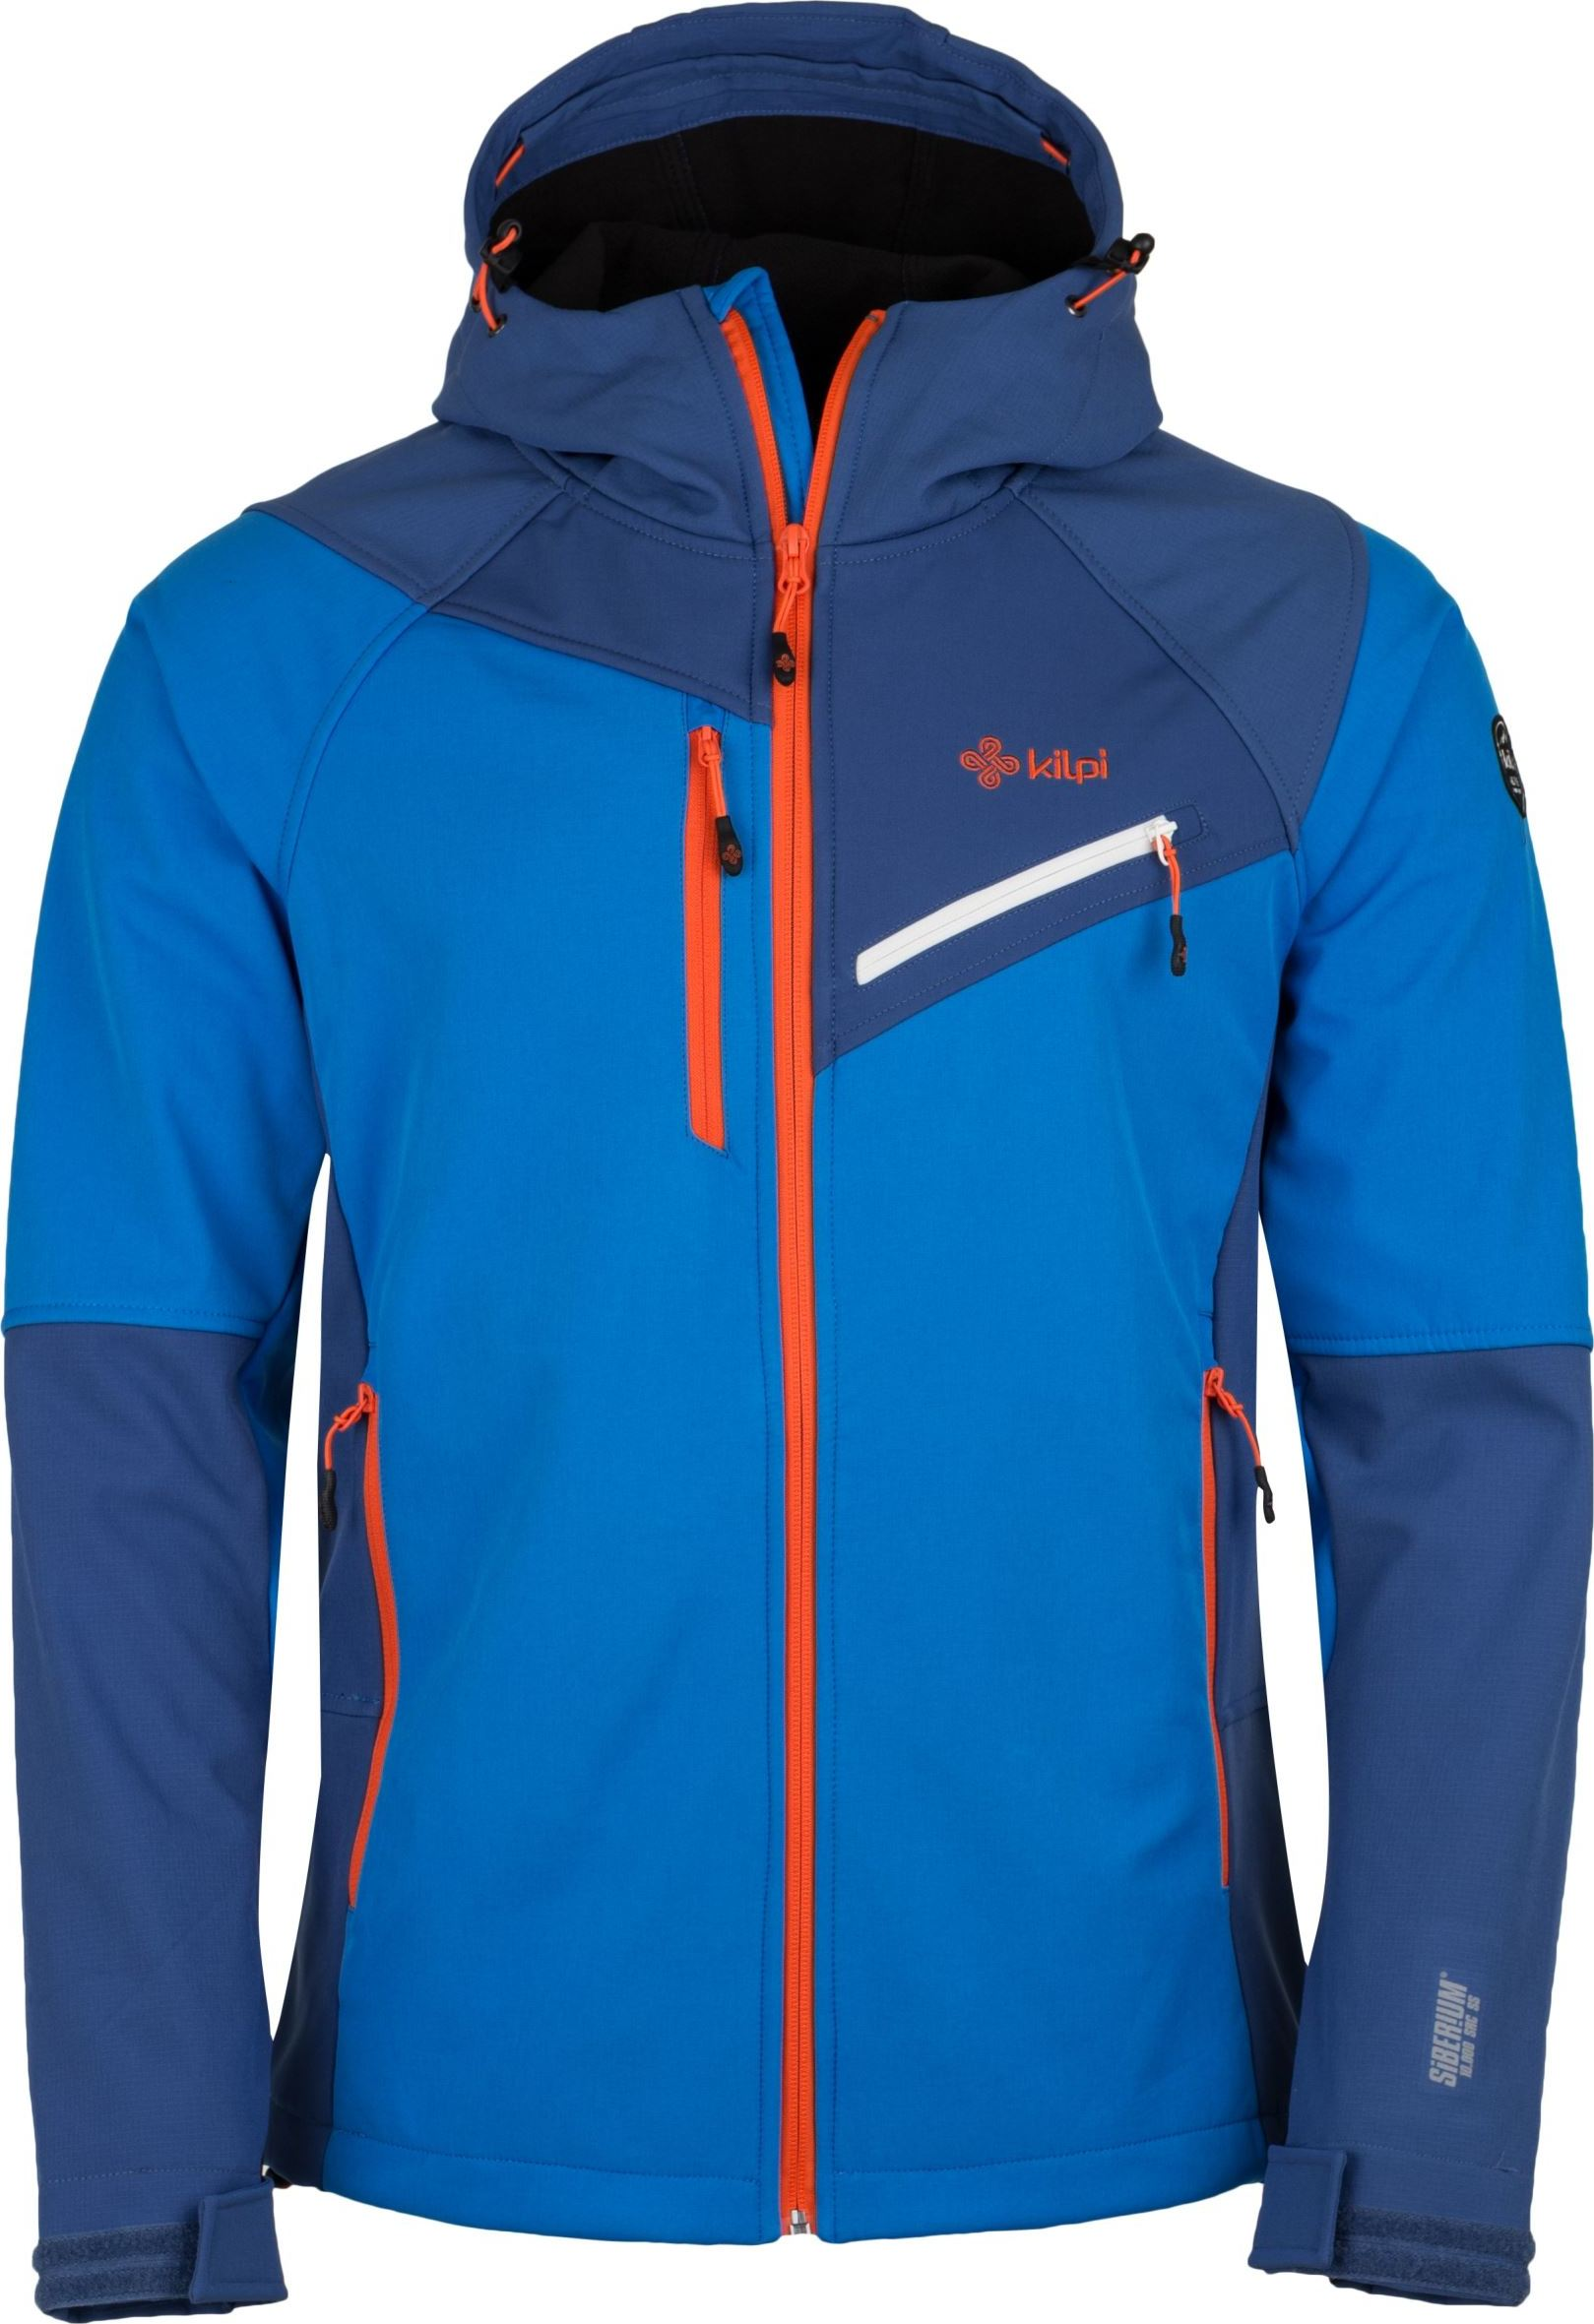 Pánská softshellová bunda KILPI ZENITH-M Modrá Barva: Modrá, Velikost: 3XL